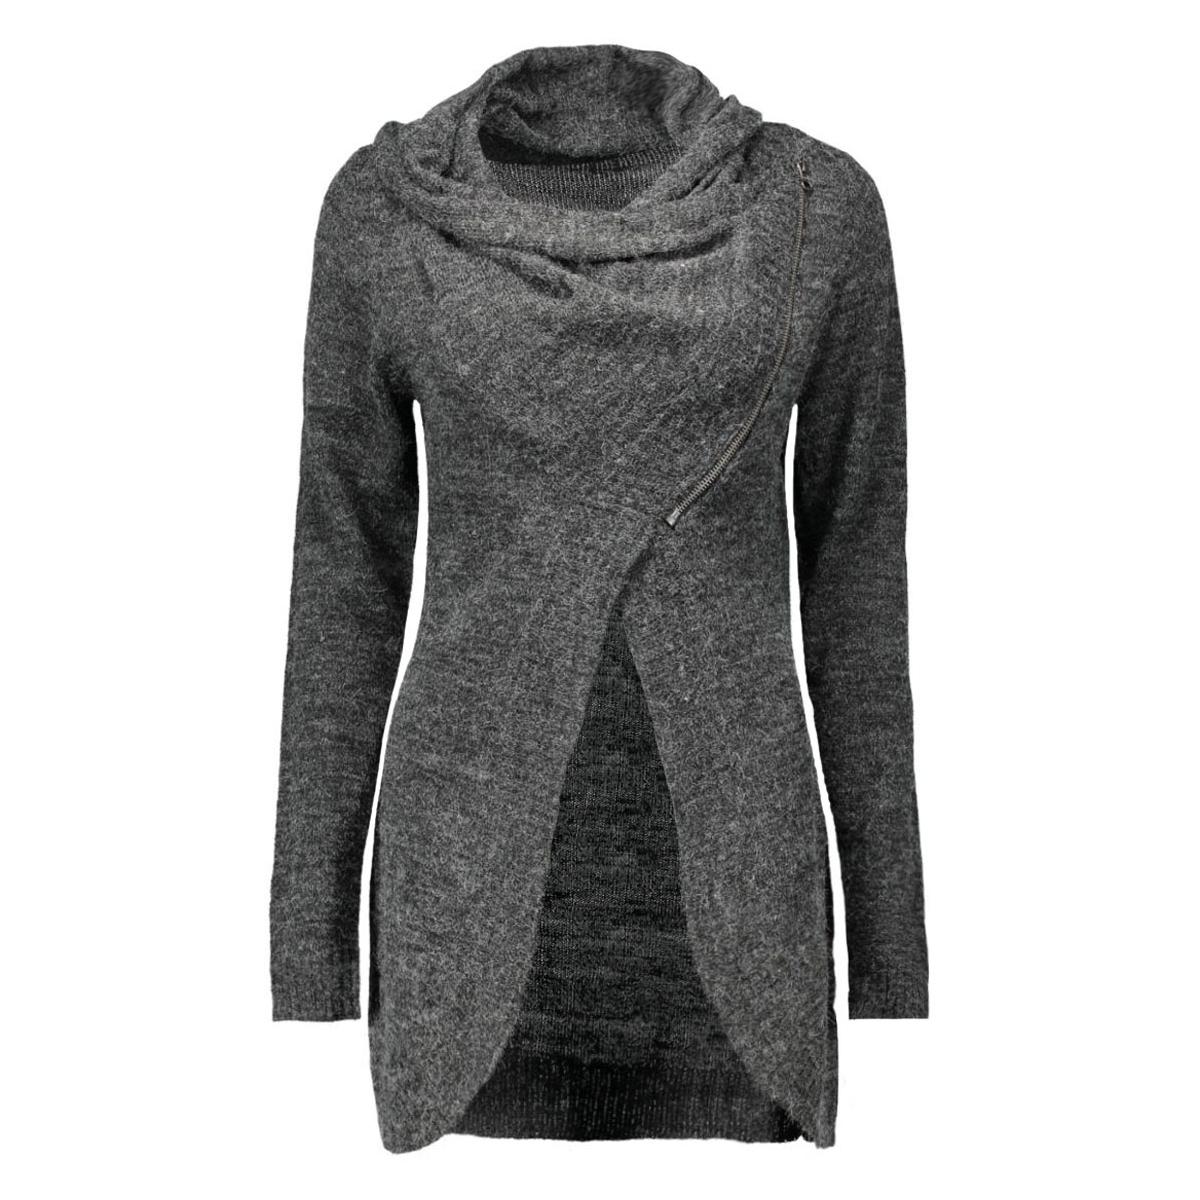 onlnew hayley l/s zip cardigan knt 15100922 only vest dark grey melange